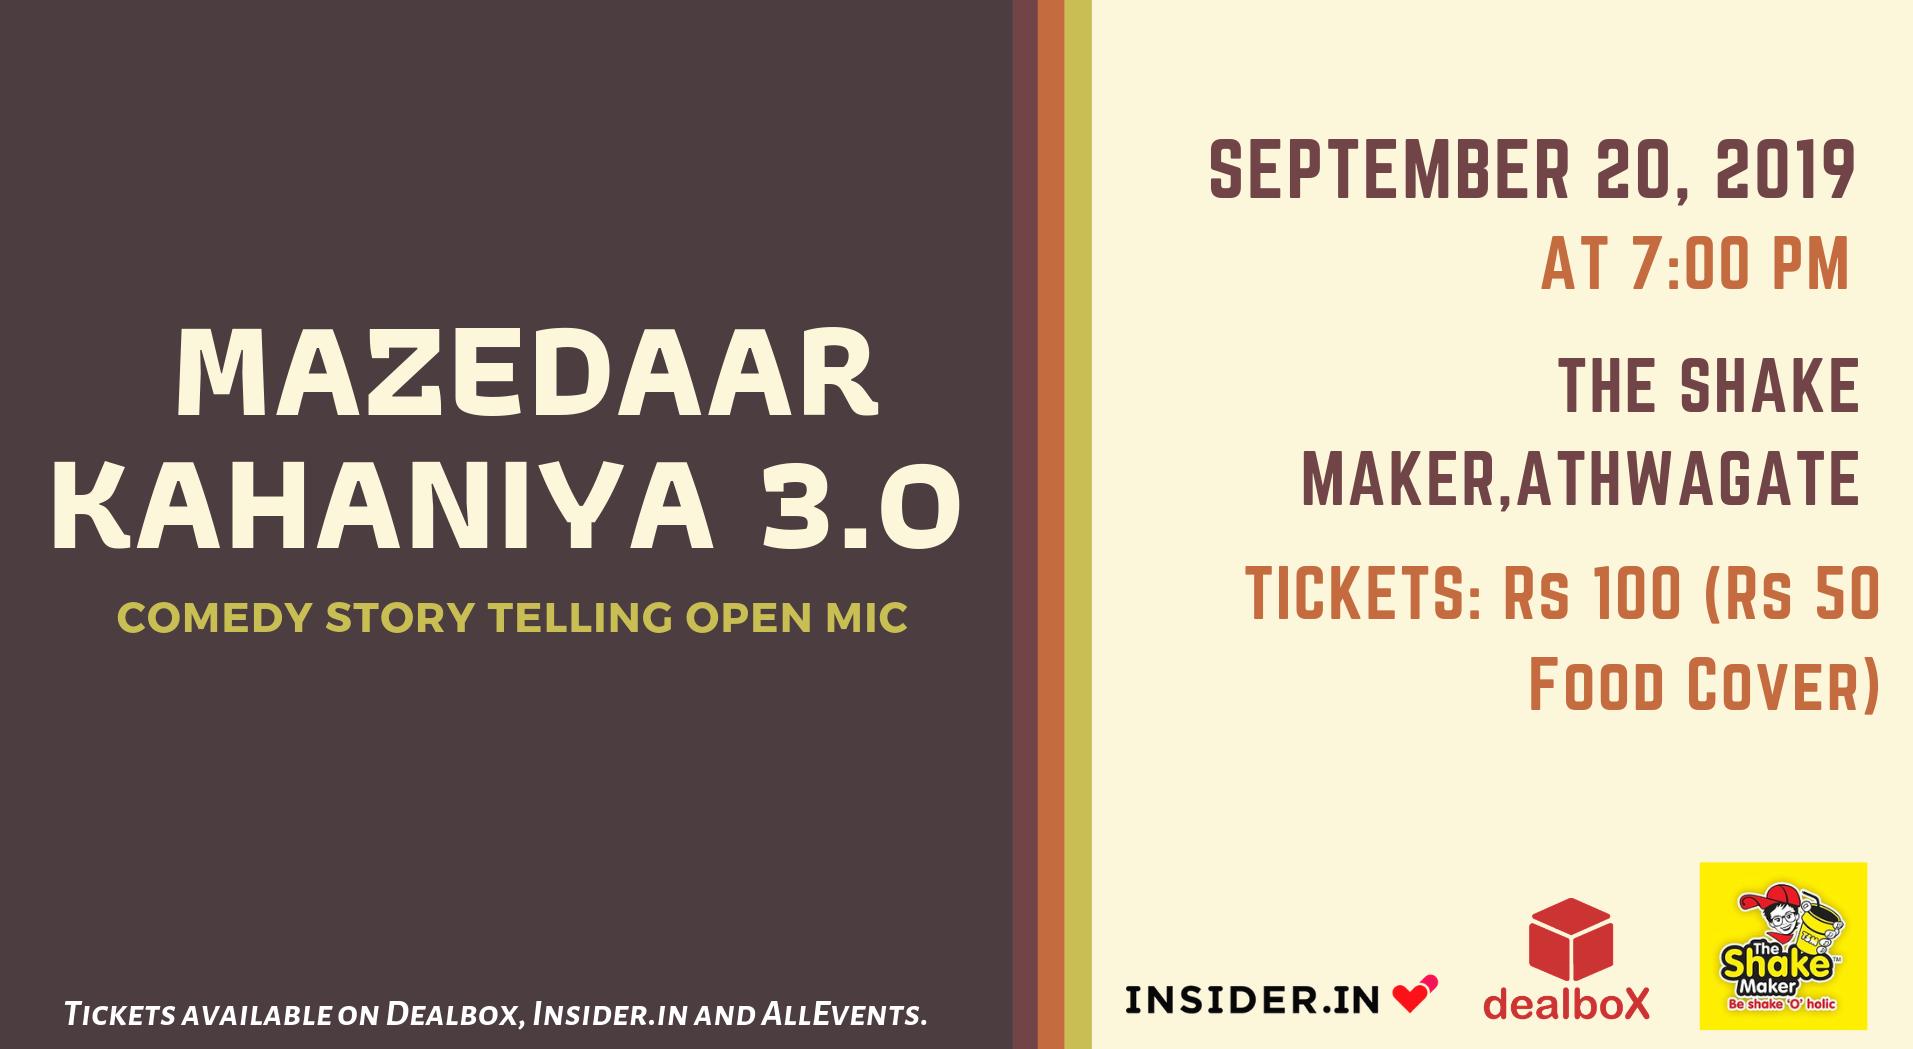 Book Mazedaar Kahaniya 3 0 (Sep 2019) Event Tickets